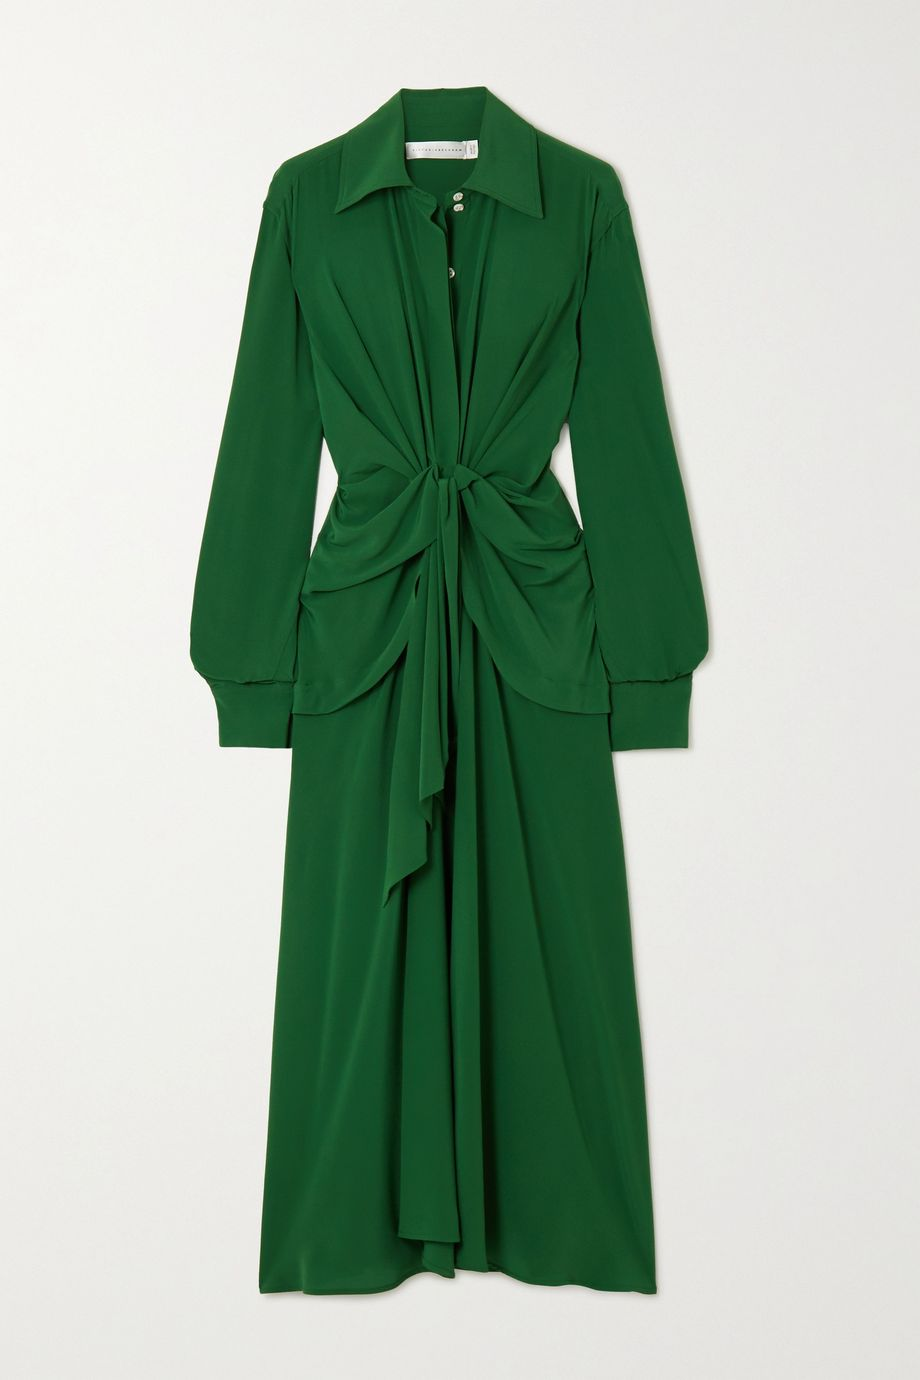 Victoria Beckham Knotted silk crepe de chine midi dress